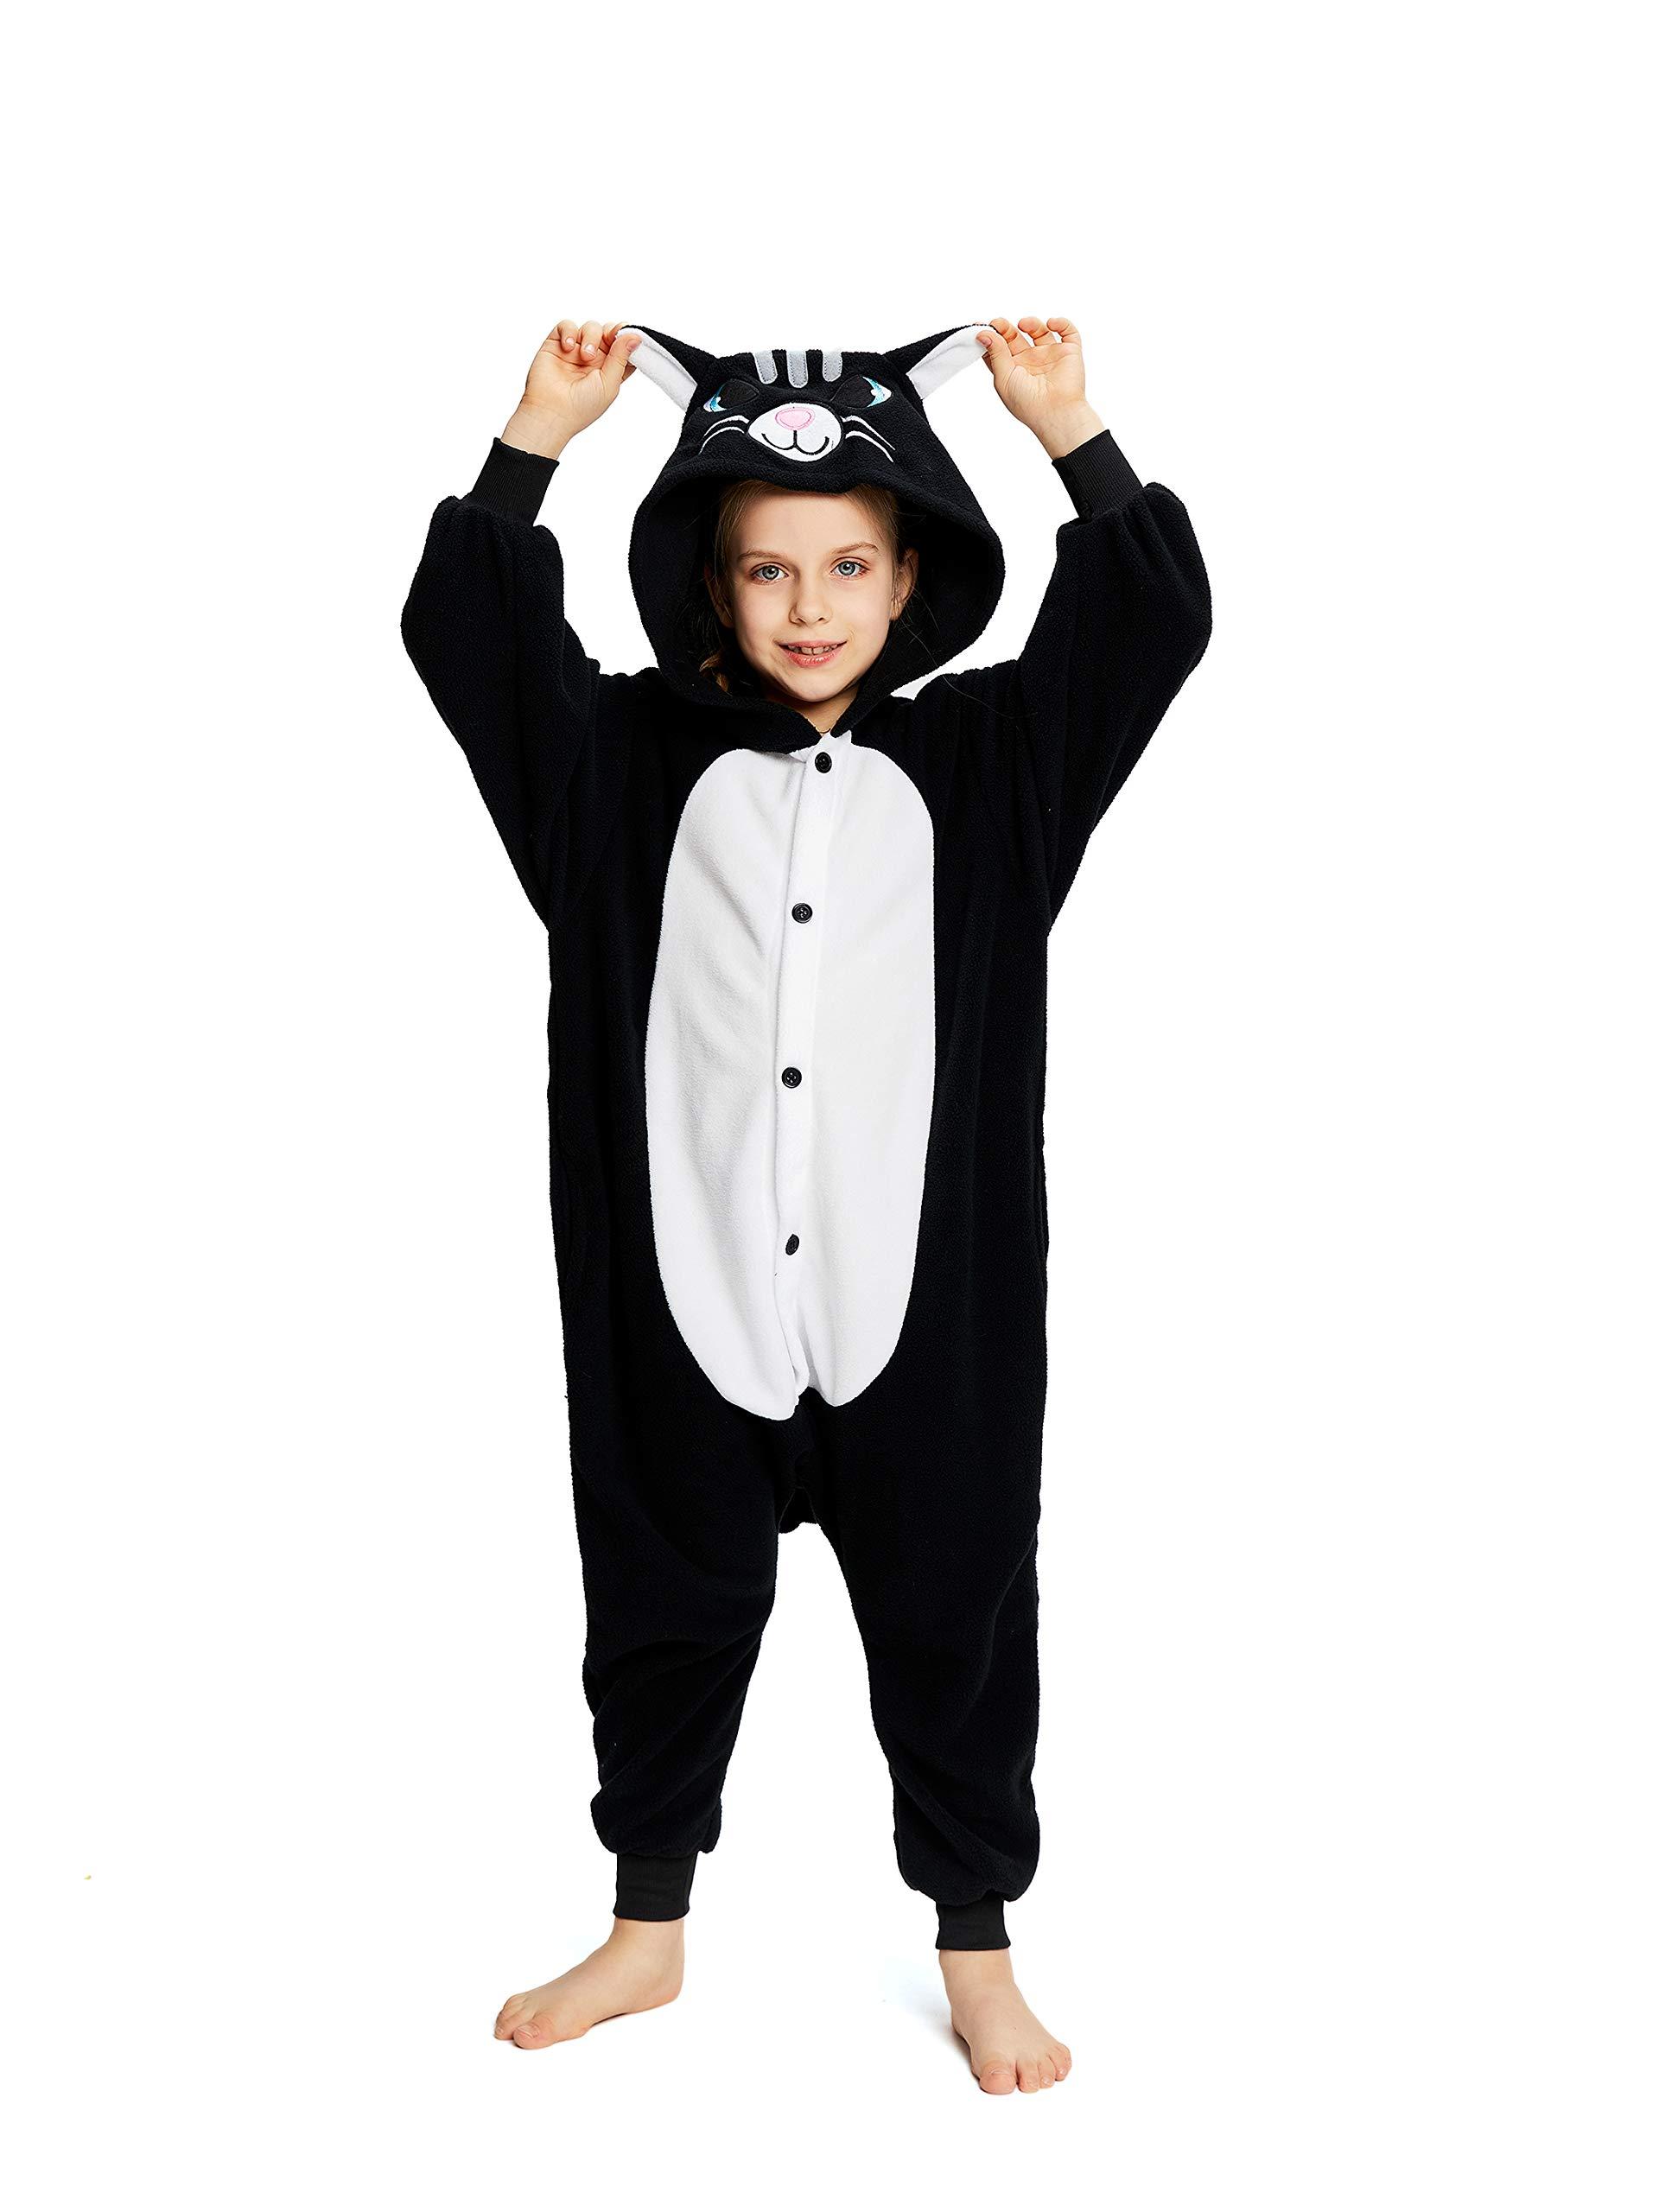 NEWCOSPLAY Unisex Children Koala Pajamas Halloween Costume